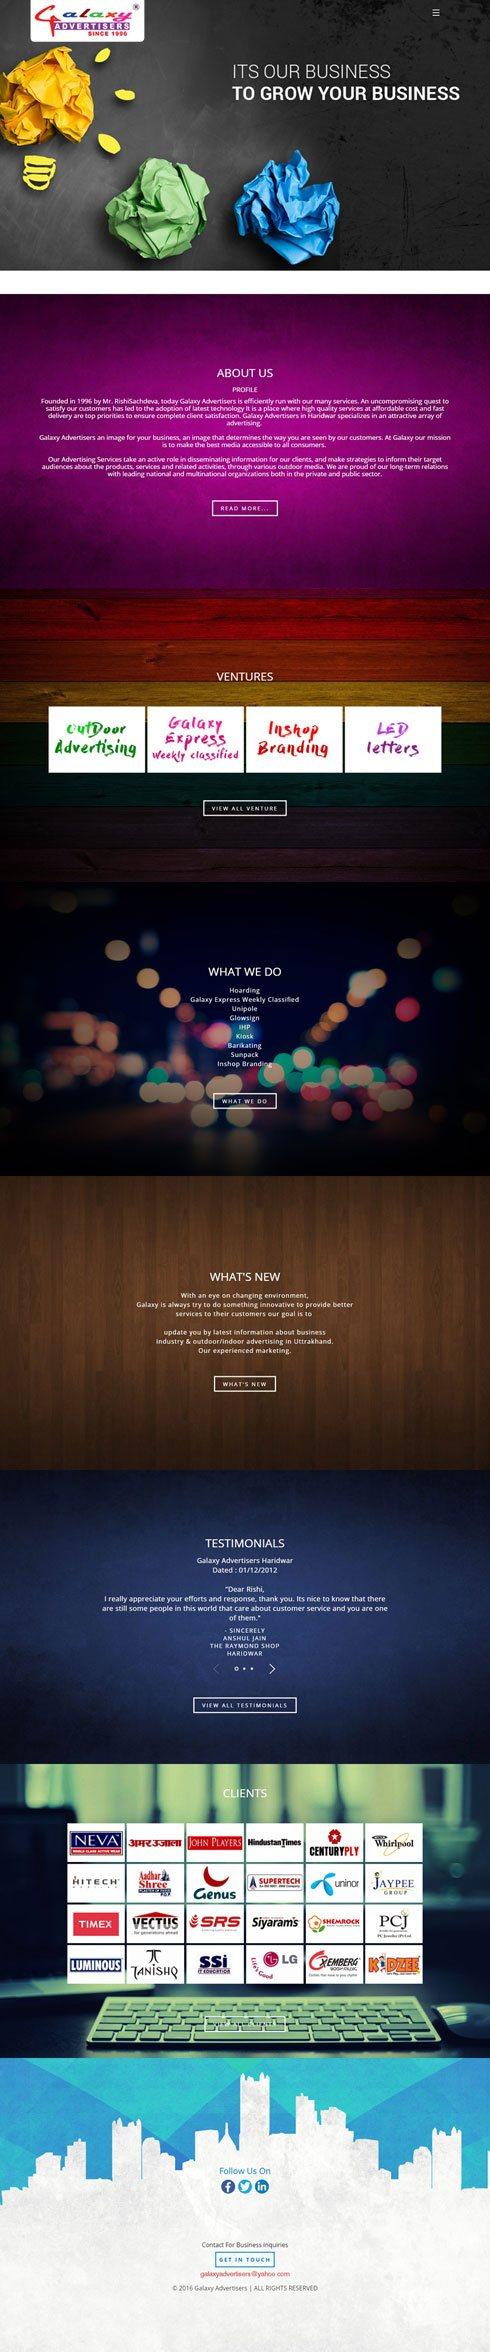 Galaxy Advertiser India Web Design